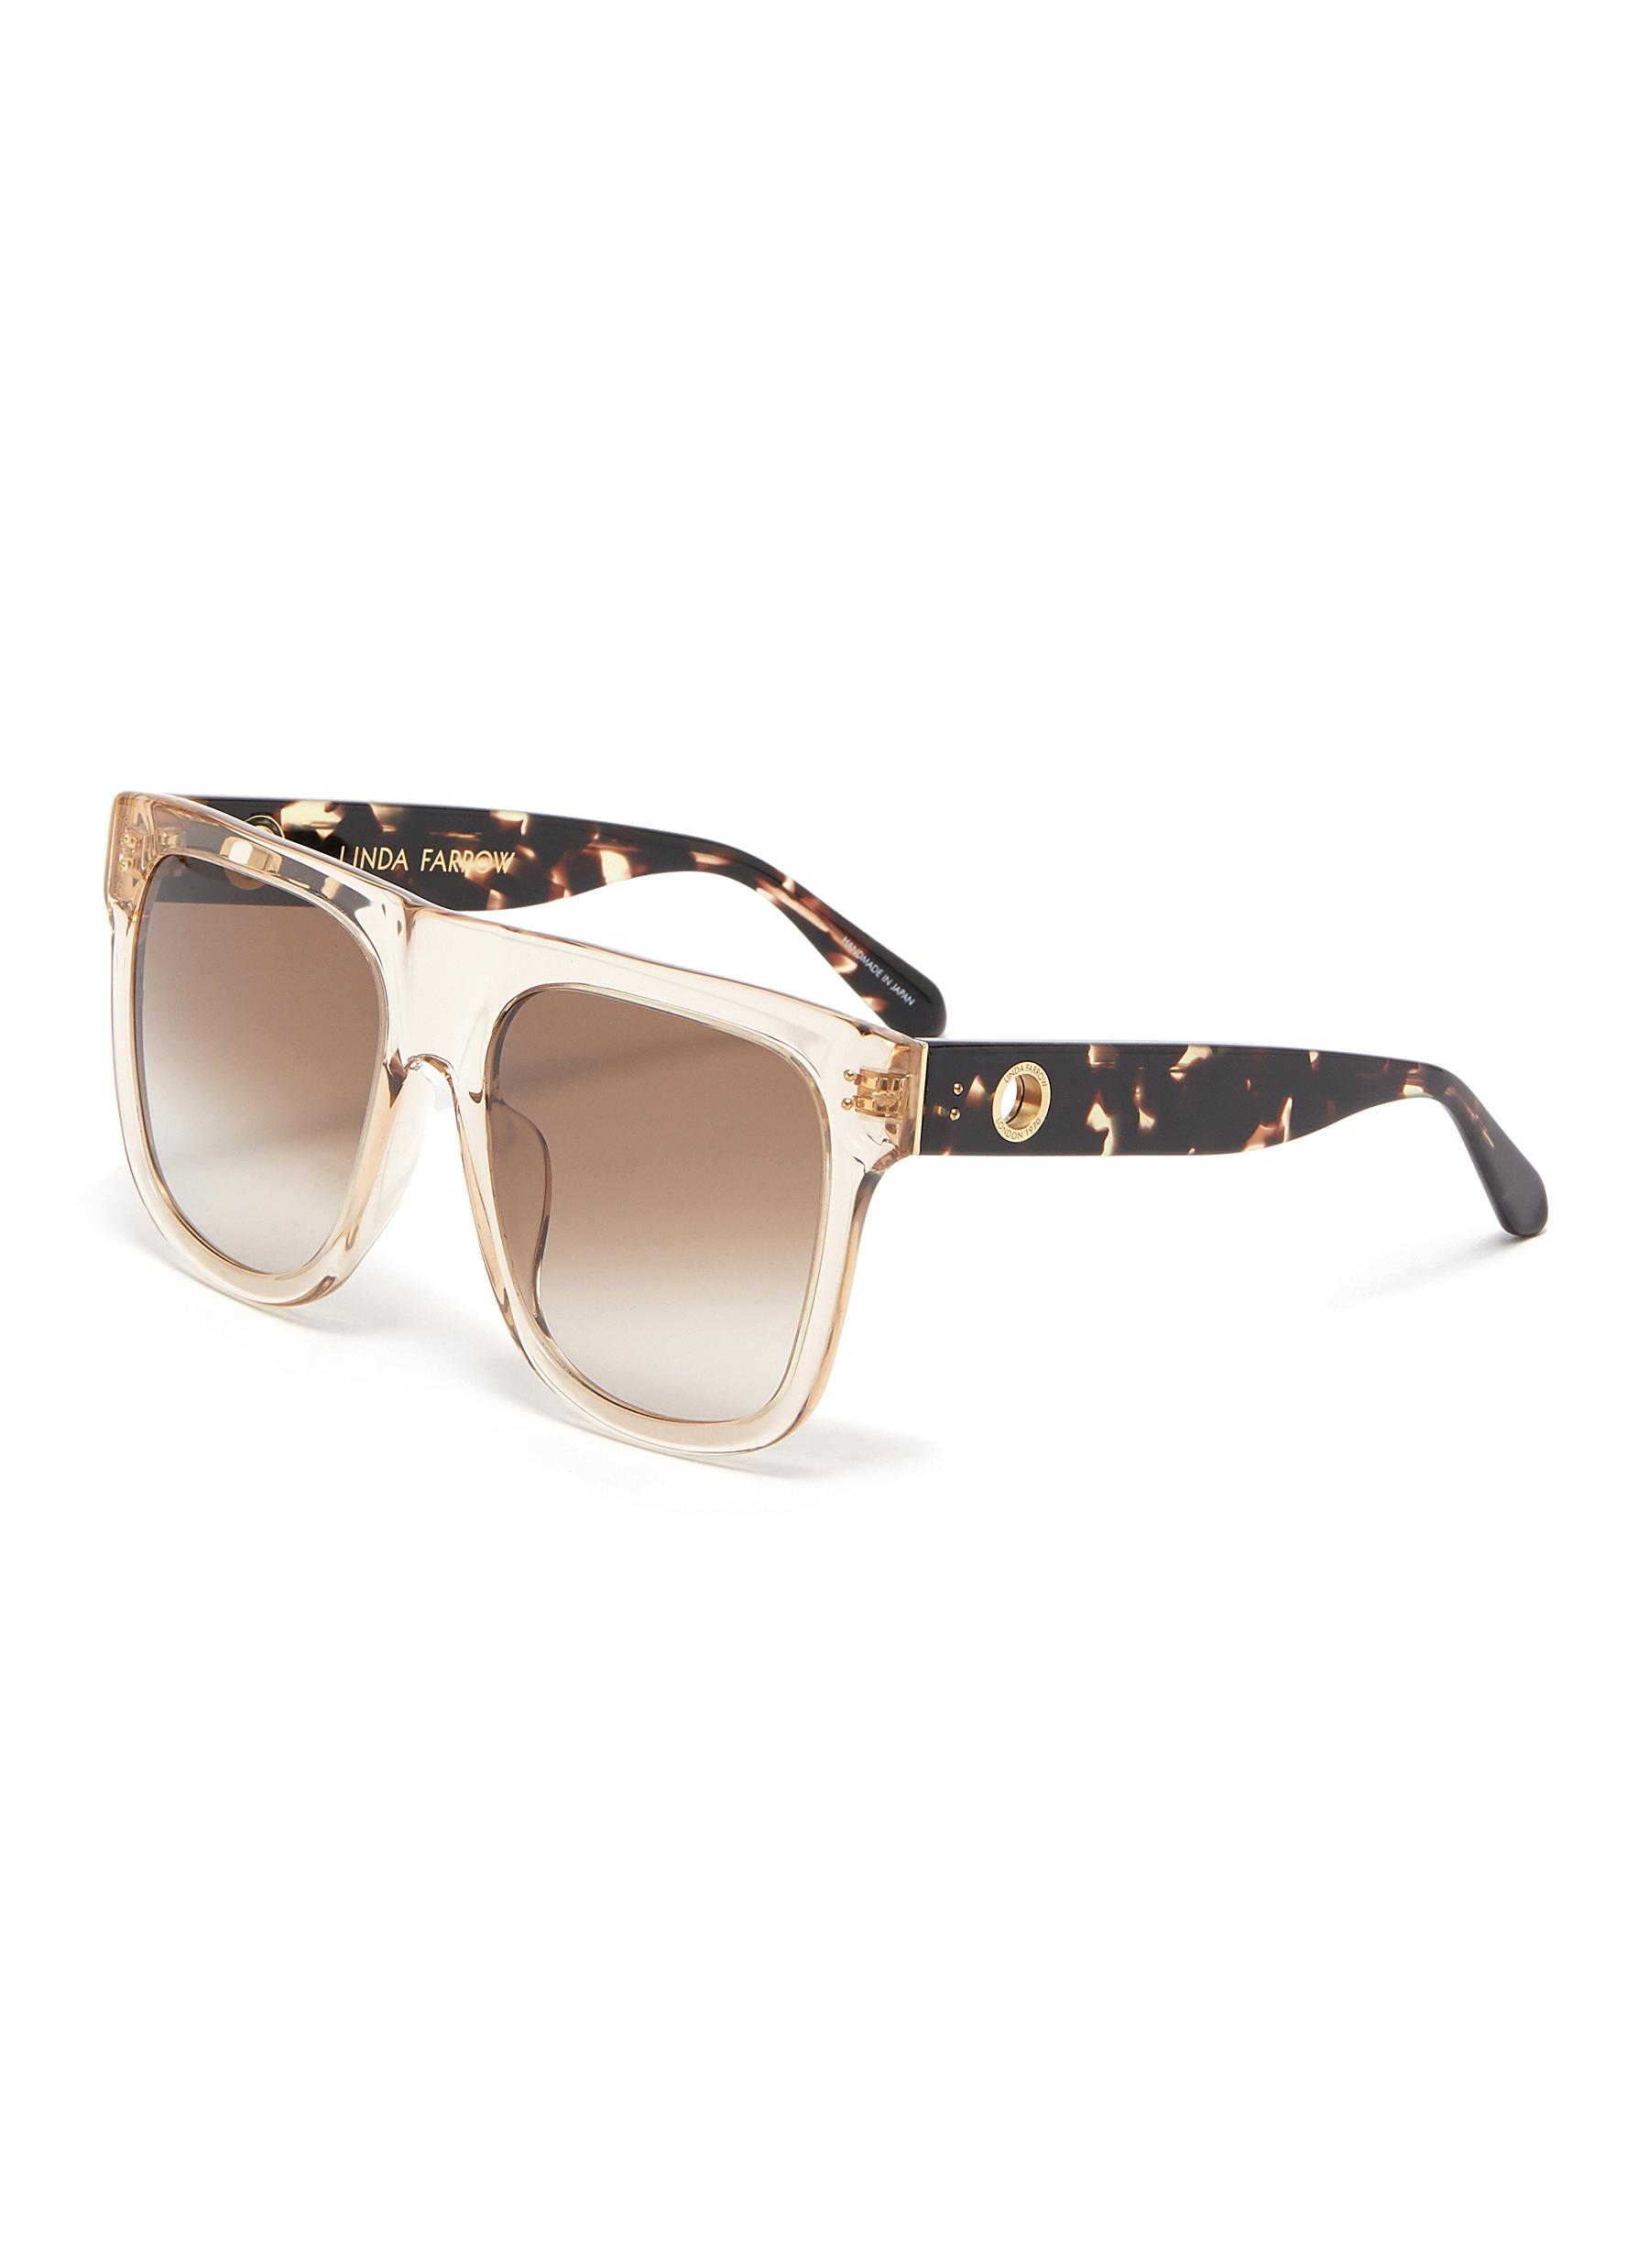 Carolina' Oversized Acetate Square Frame Sunglasses